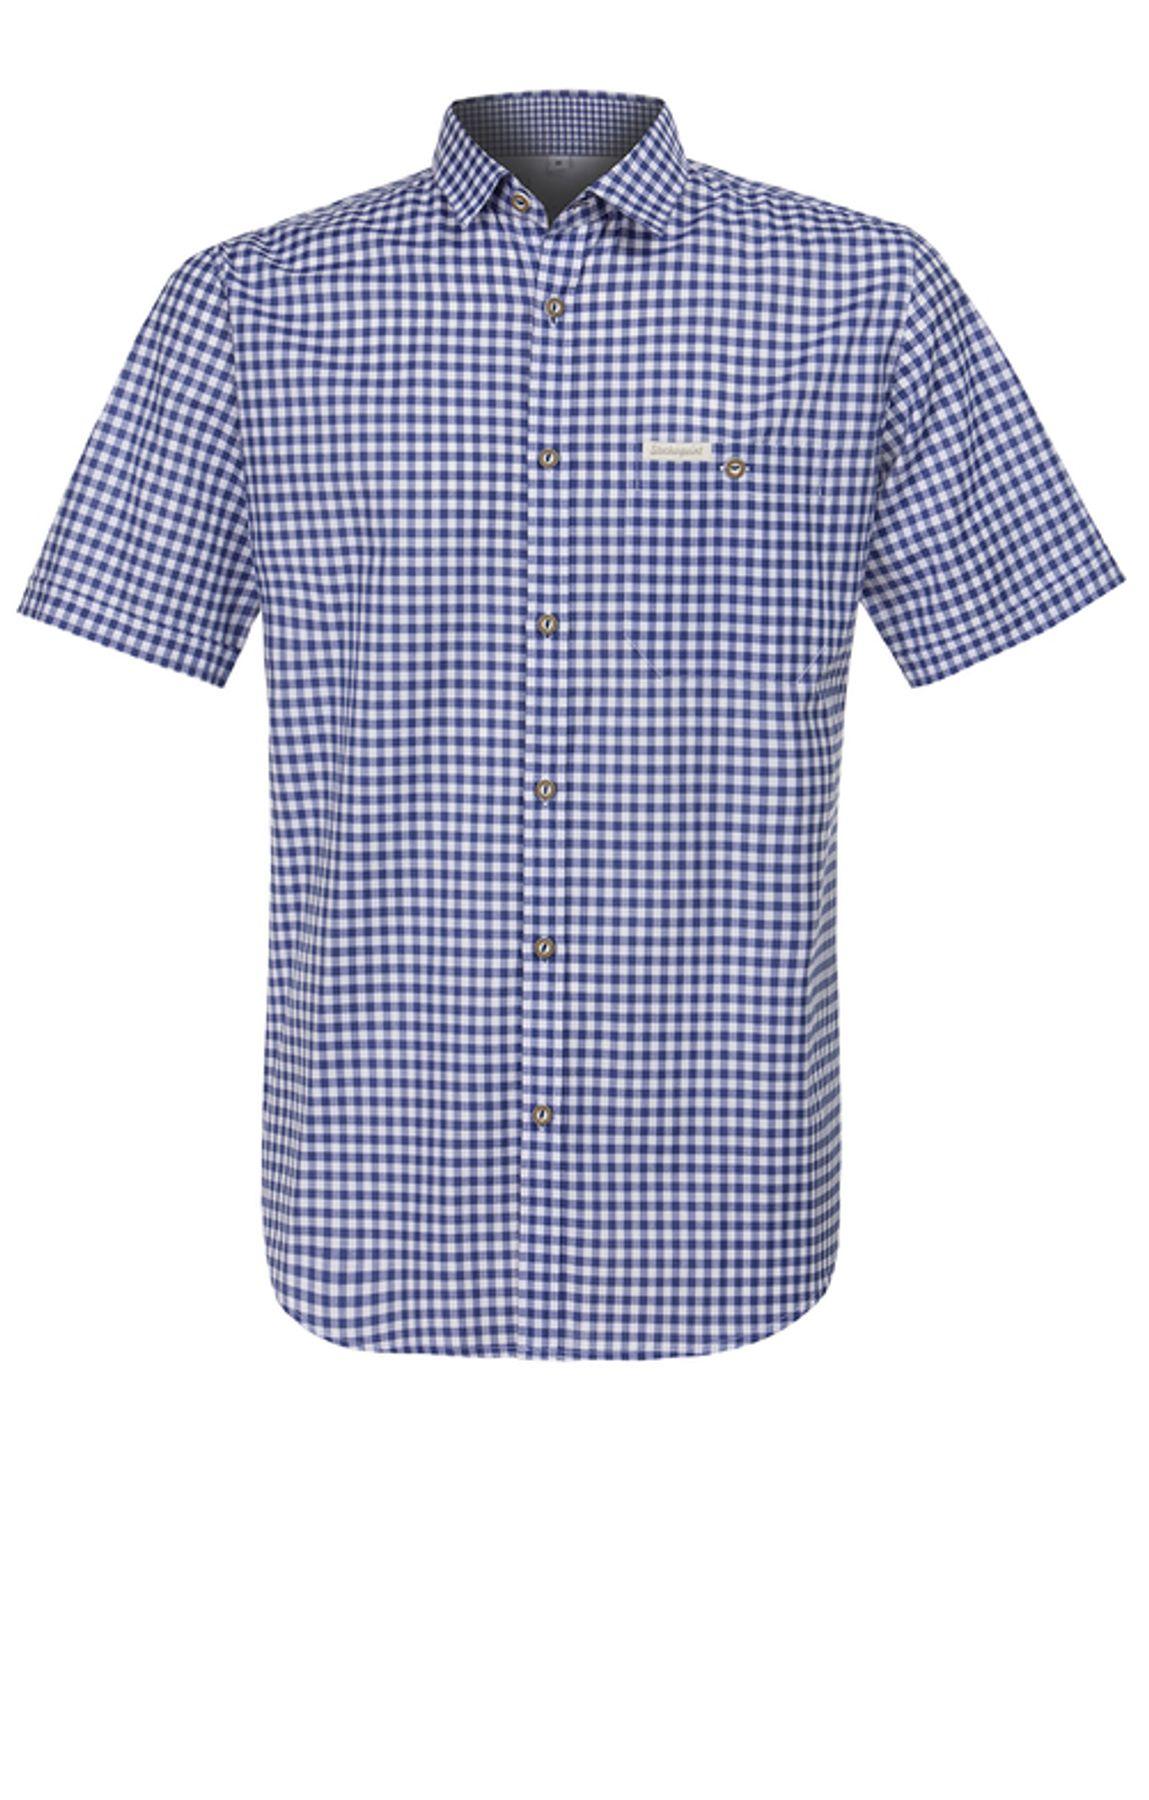 Stockerpoint - Herren kurzarm Trachtenhemd in verschiedenen Farben, Renko3 – Bild 12